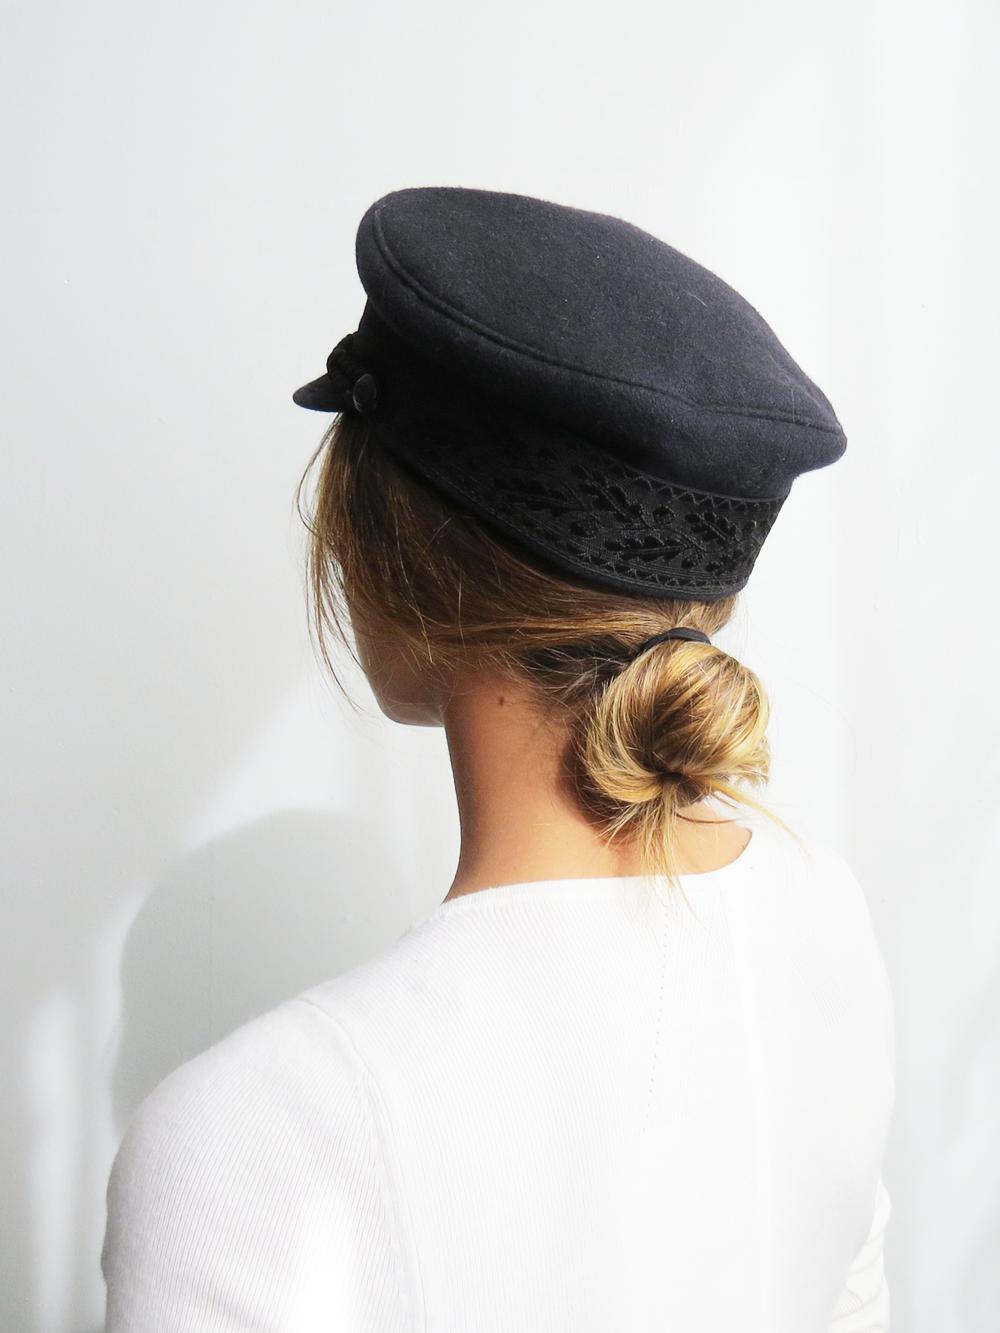 70f8004f352 Mariner Captain s Hat    Vintage 1980 s Navy Cap SOLD